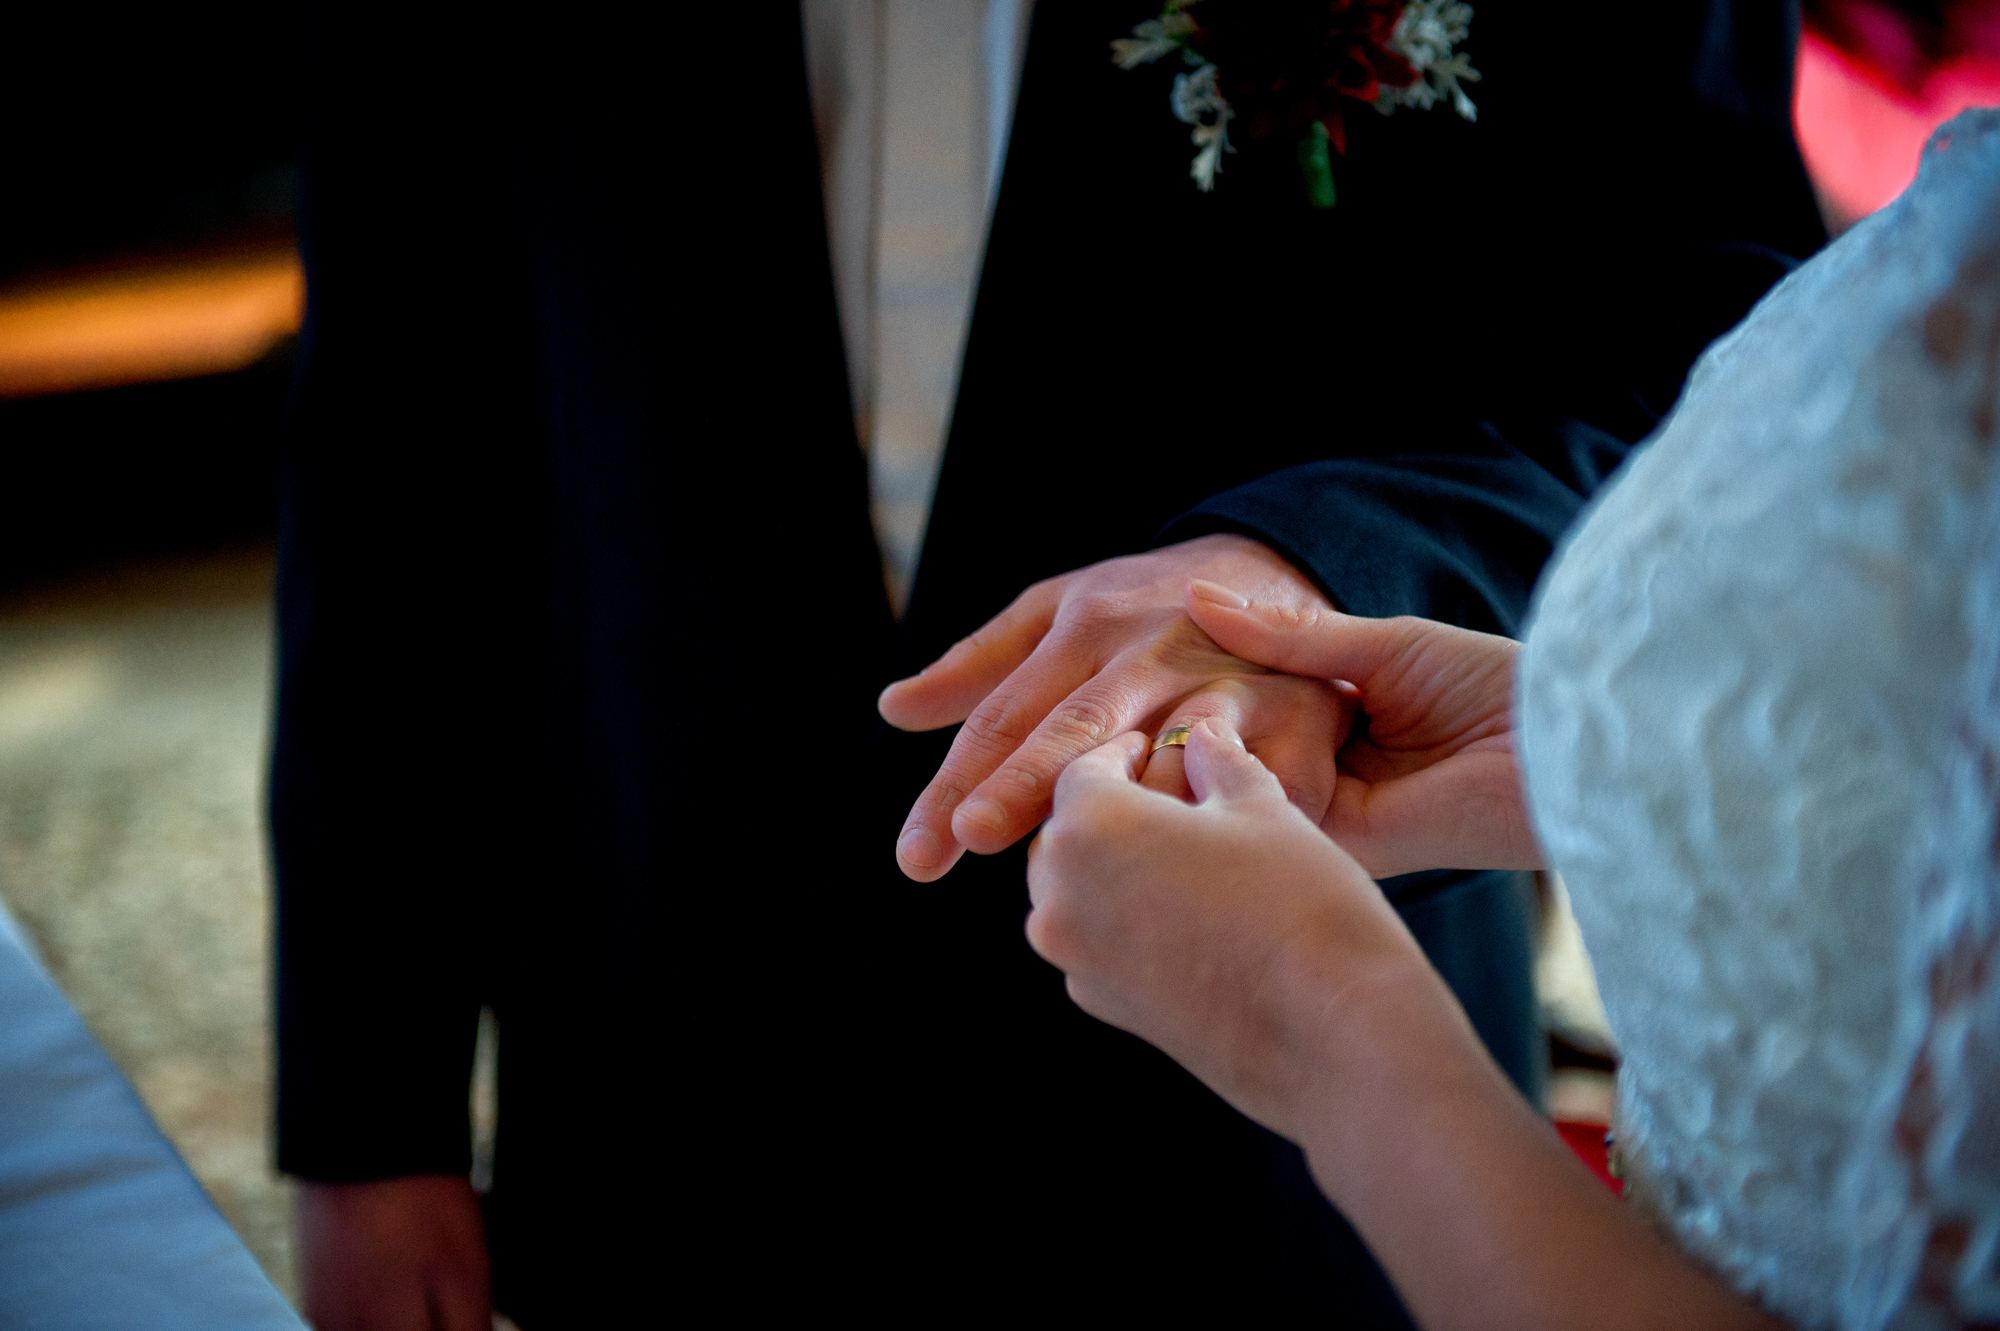 venezia matrimonio simbolico fotografia carmini laure jacquemin fotografo (15)